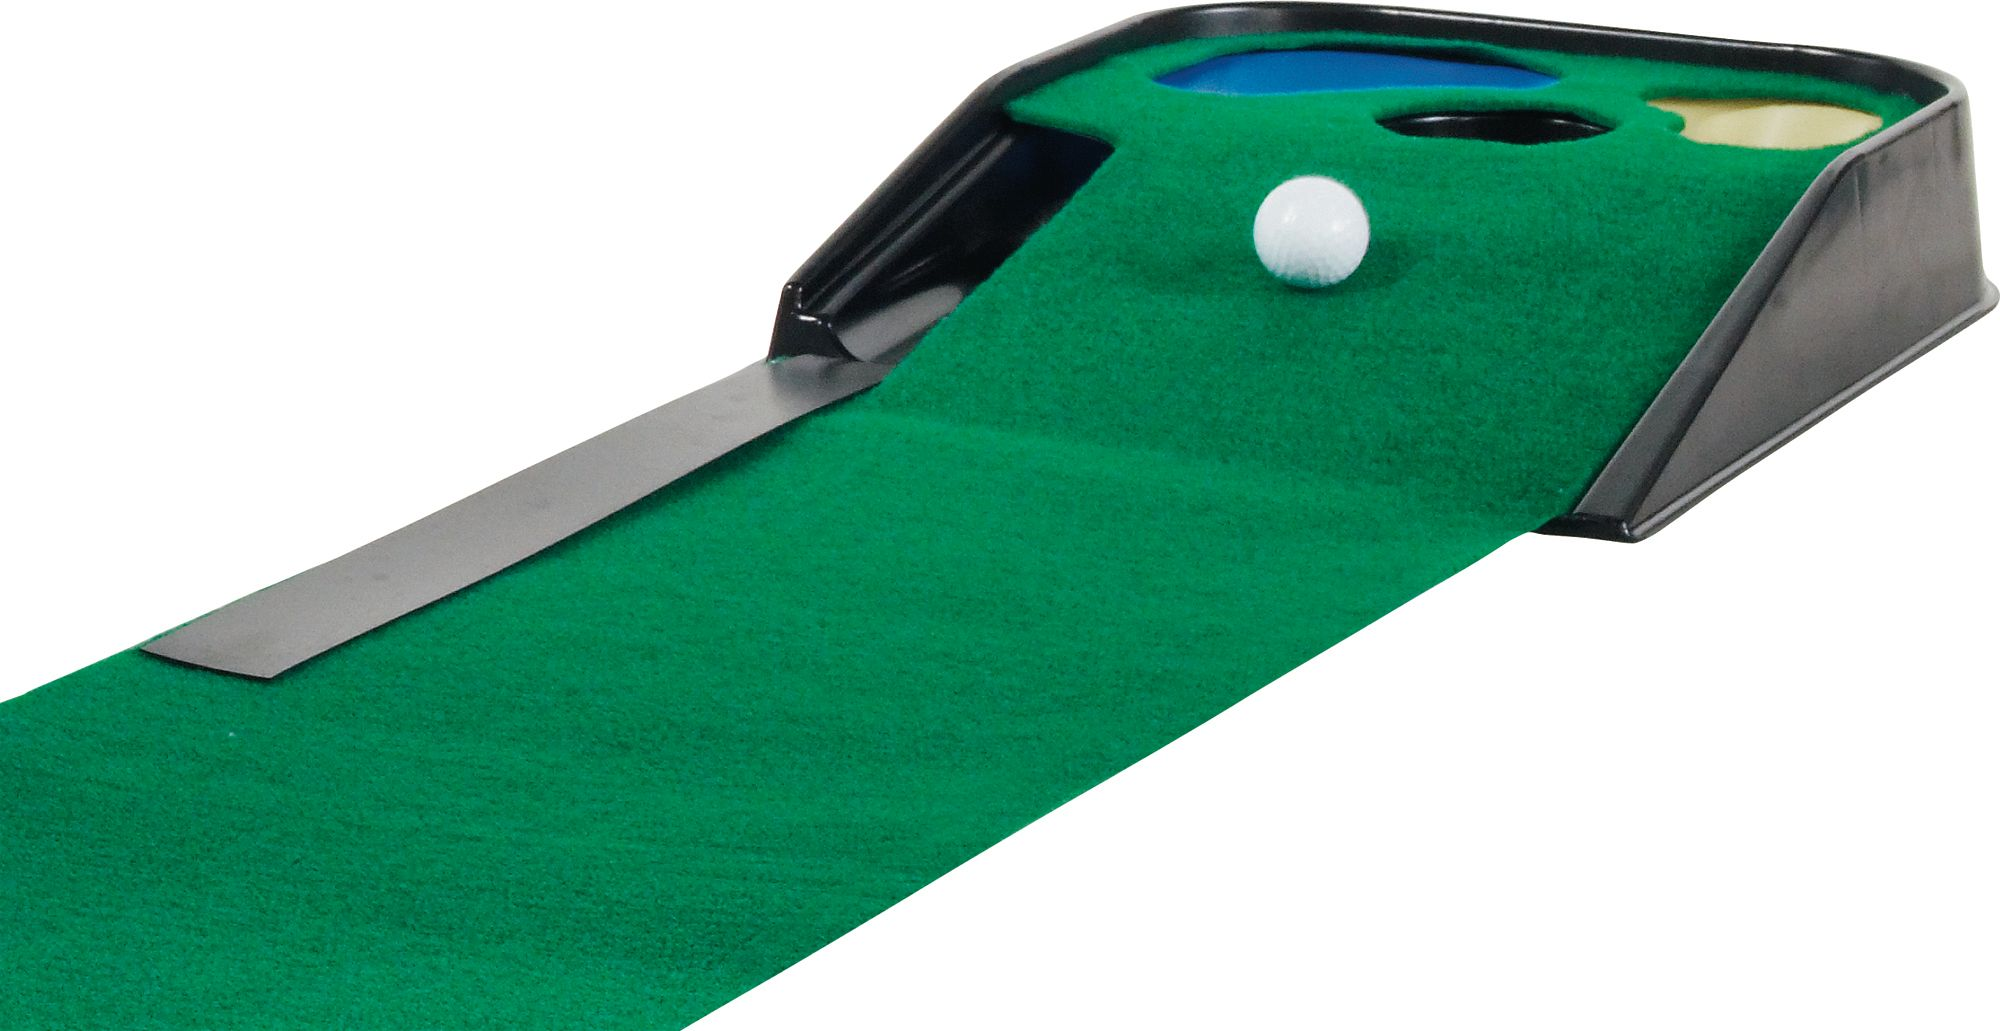 Golf Putting Mat With Ball Return Auto-return Putting Mat